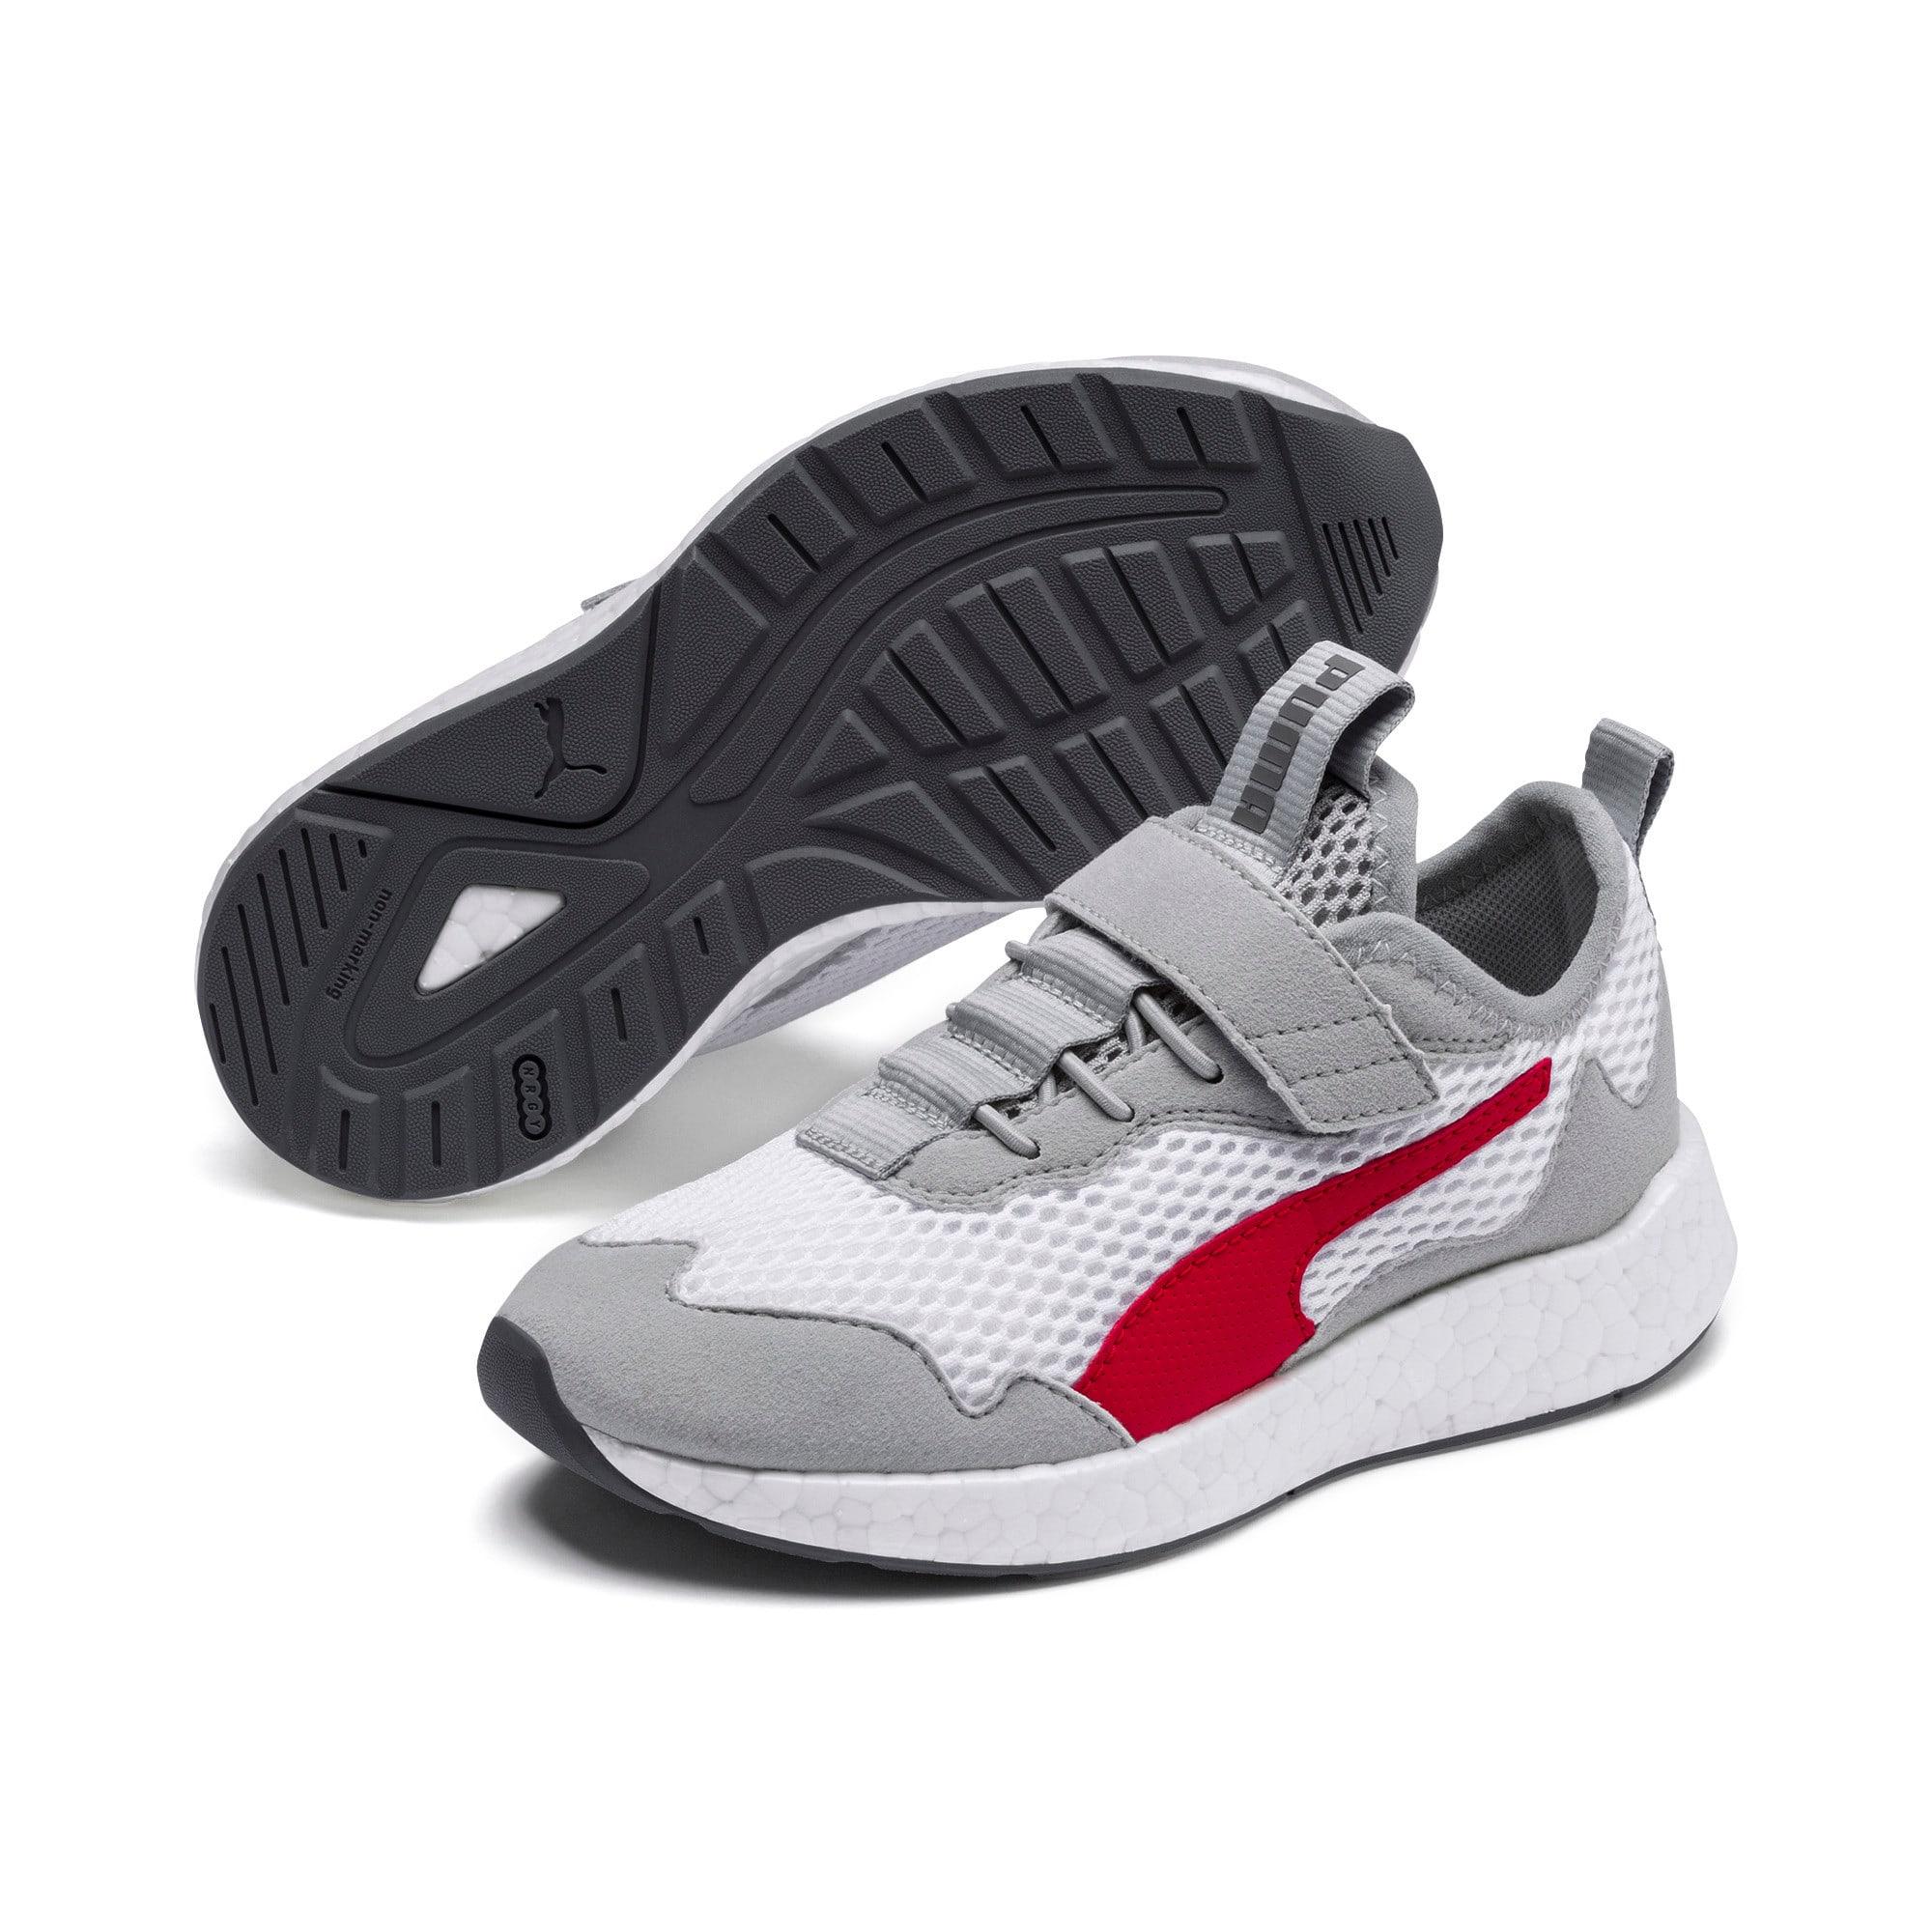 Thumbnail 2 of NRGY Neko Skim AC Shoes PS, White-H Rise-CASTLEROCK-Red, medium